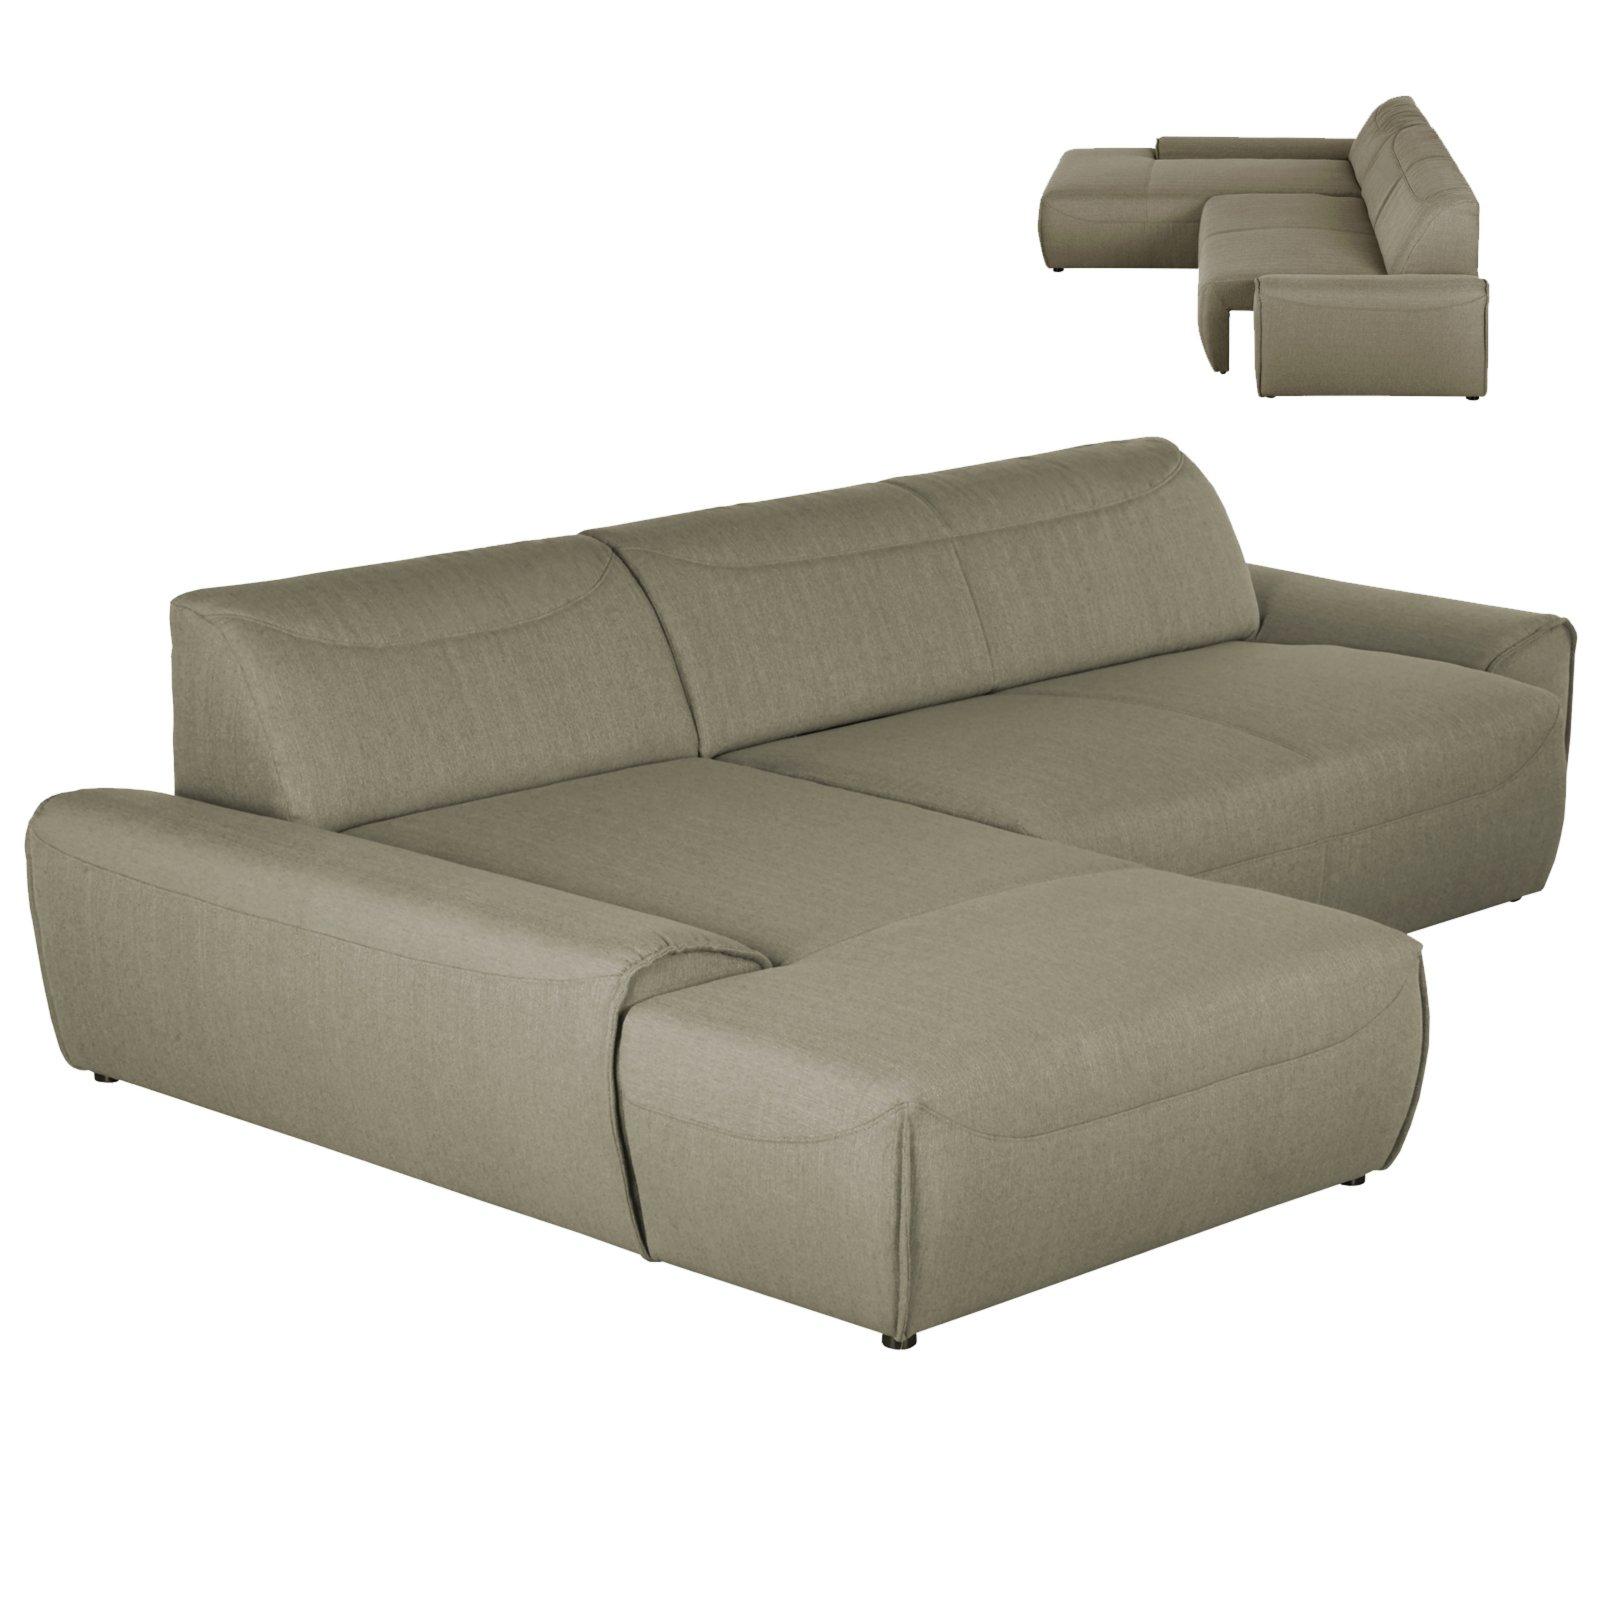 ecksofa schlamm elegant carryhome ecksofa lederlook bettkasten grau with ecksofa schlamm alt. Black Bedroom Furniture Sets. Home Design Ideas